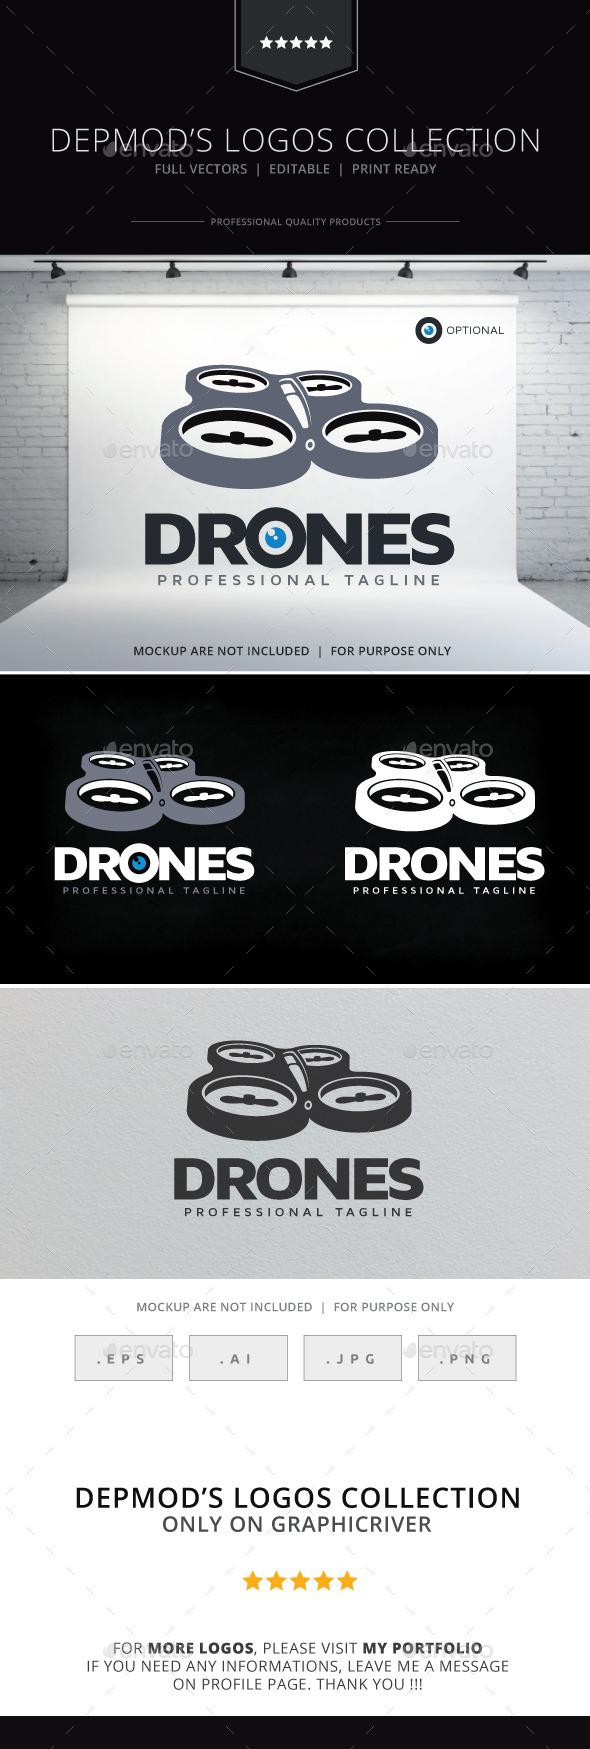 GraphicRiver Drones Logo 10068748